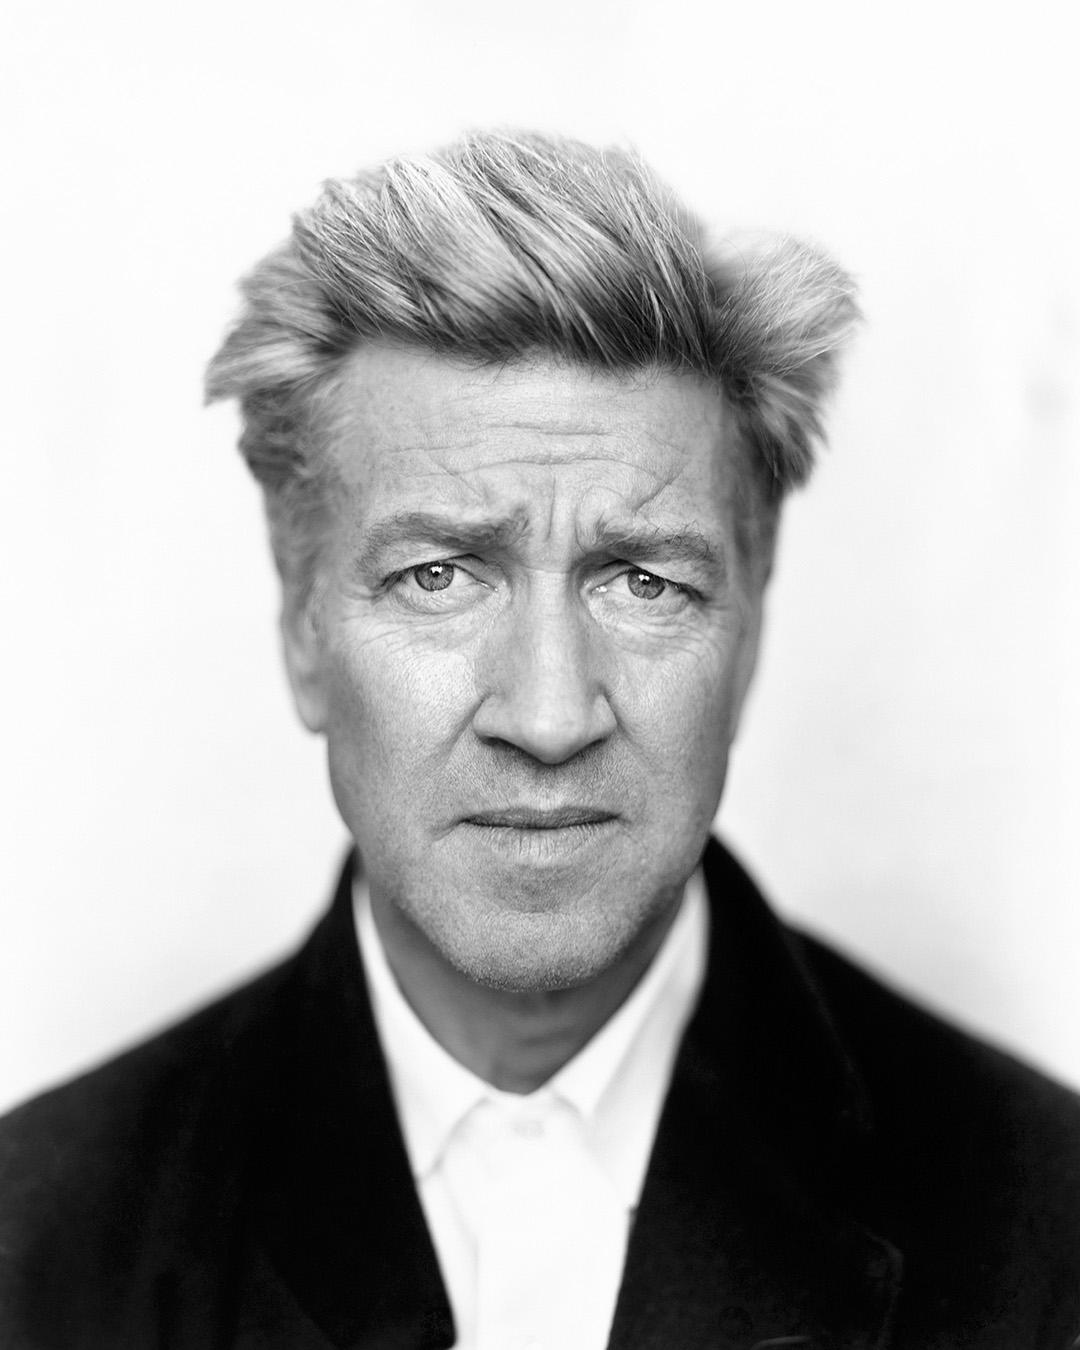 Director David Lynch by celebrity photographer Patrik Andersson